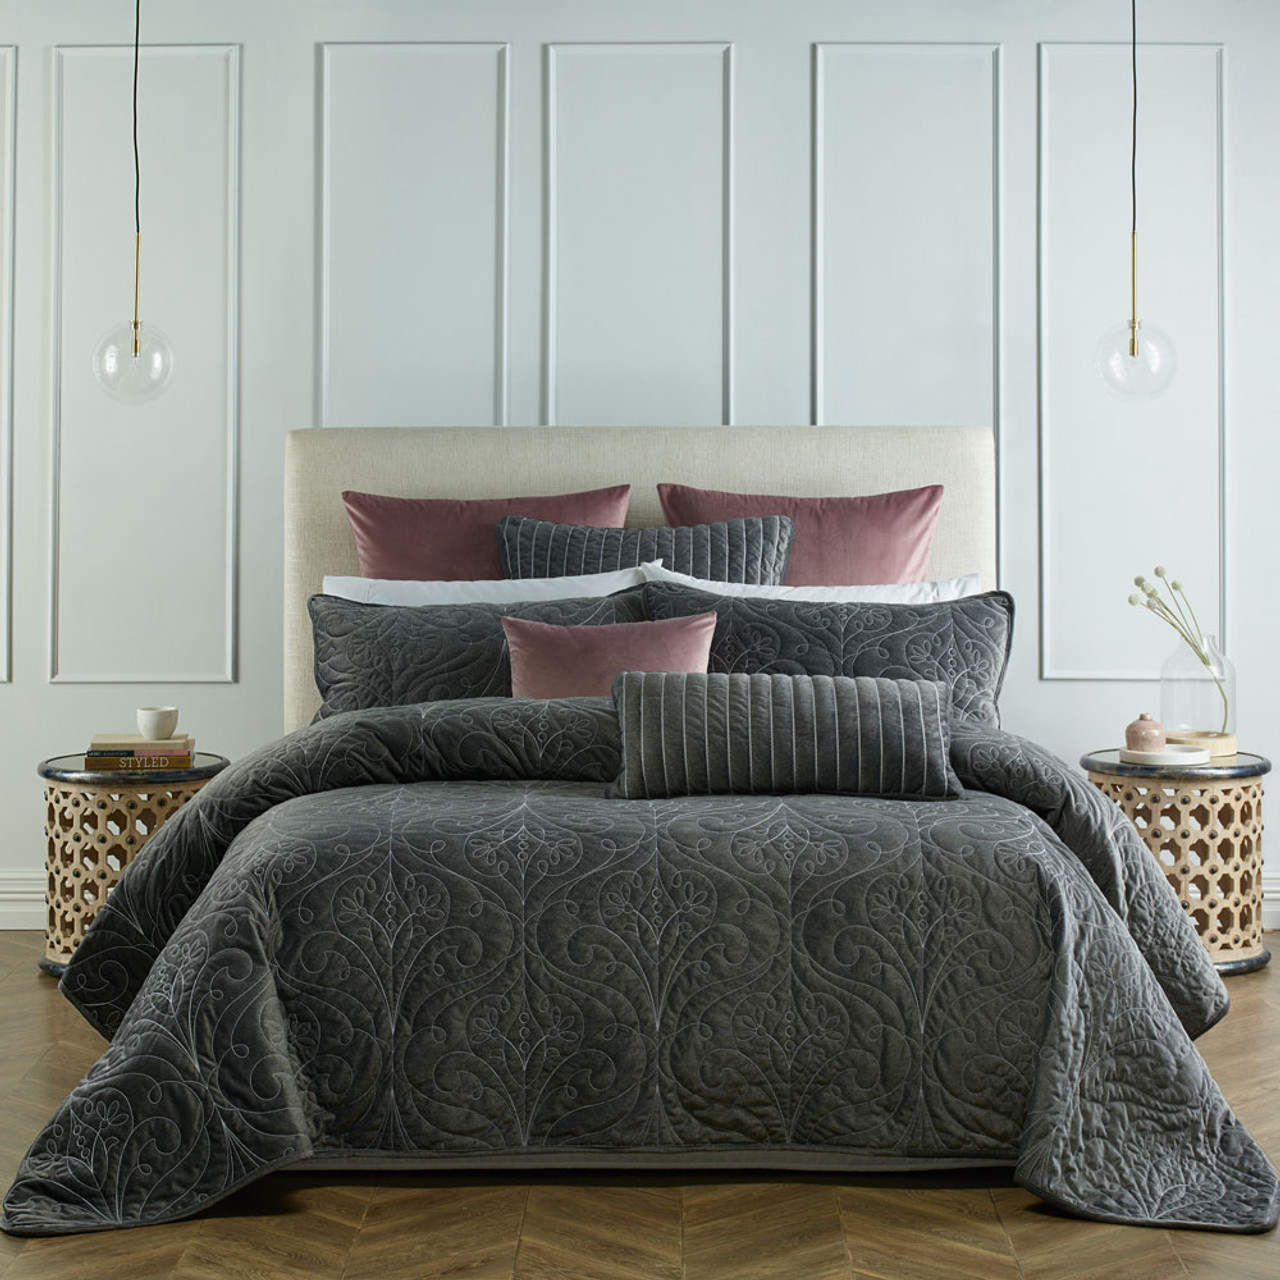 Bianca Single / Double Bed Genevieve Coal Coverlet Set | My Linen